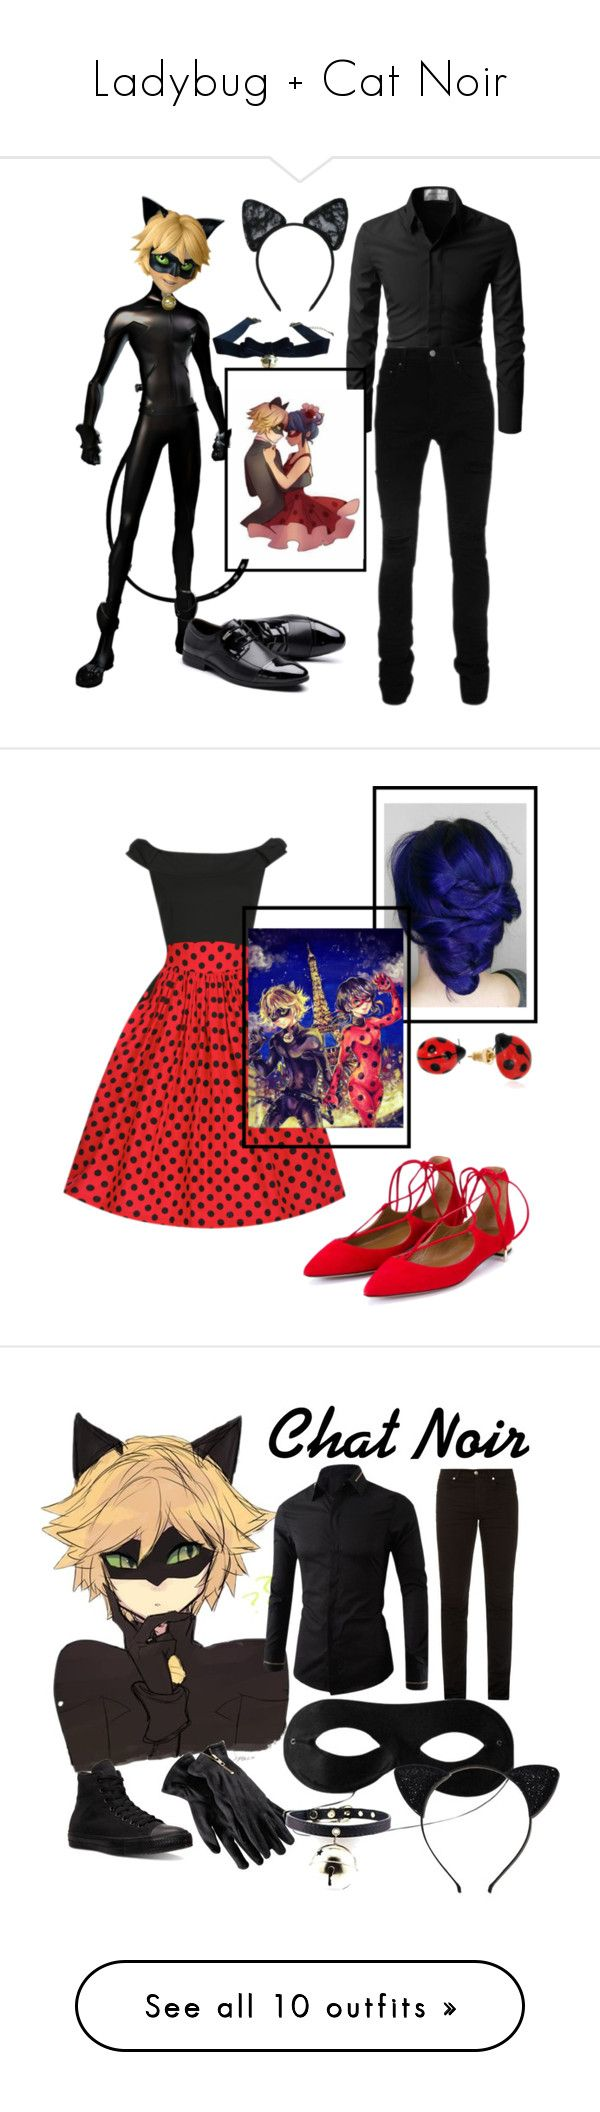 """Ladybug + Cat Noir"" by janemorguedoe ❤ liked on Polyvore featuring AMIRI, Maison Close, Aquazzura, Nach, art, Yves Saint Laurent, Merona, Kate Spade, Kevin Jewelers and ASOS"